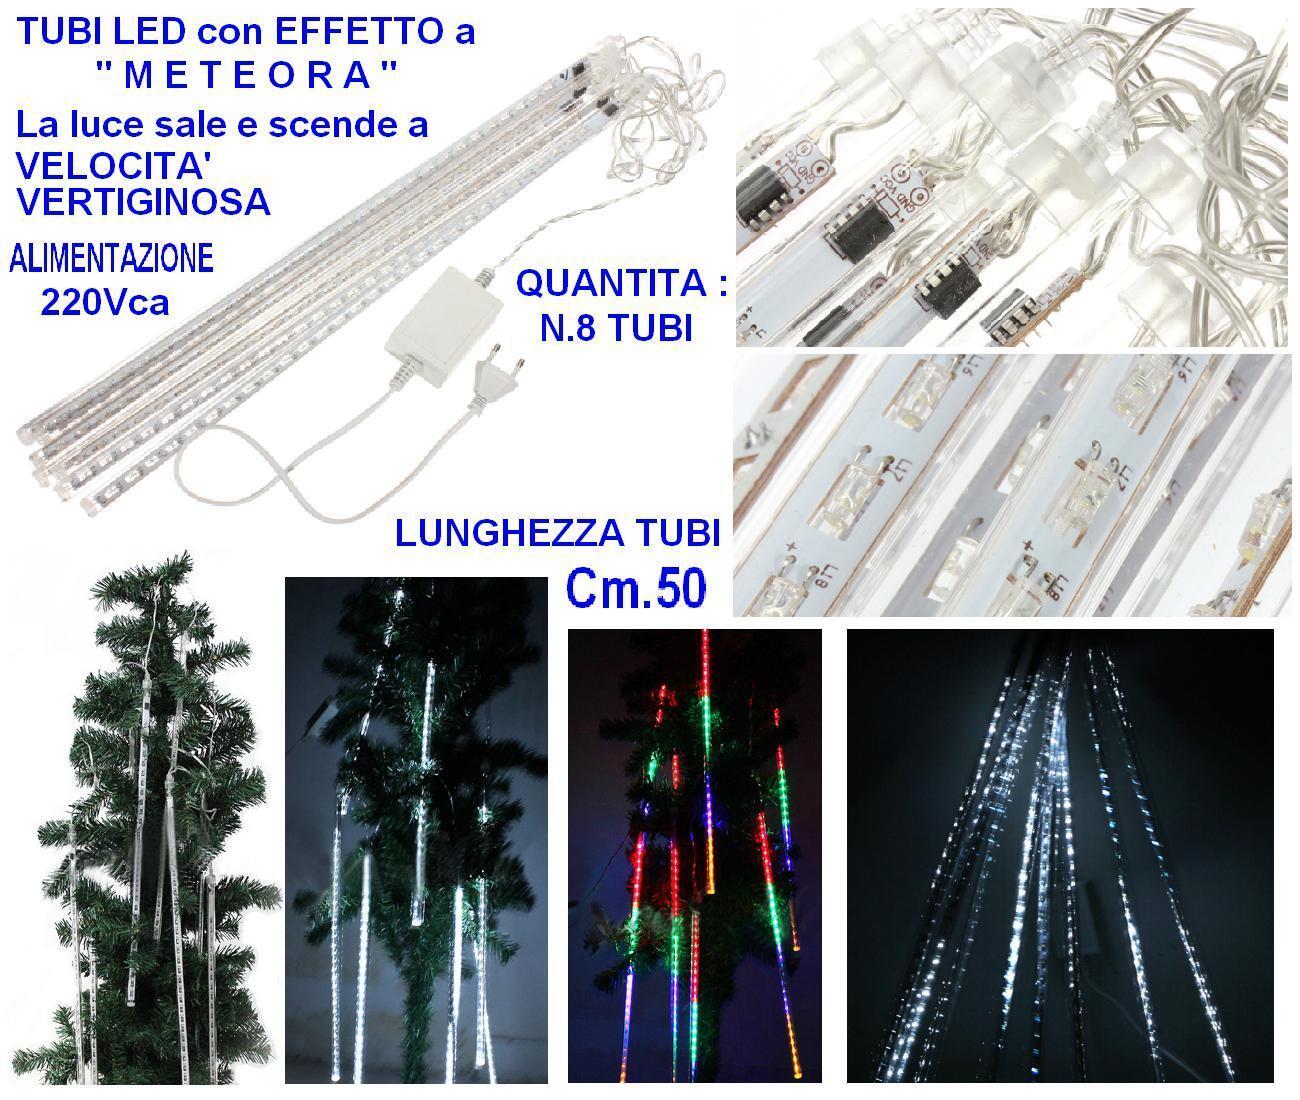 TENDA PROLUNGABILE Cm.210Lx50H  N.8 TUBI LED MULTICOLOR EFFETTO METEORA NATALE